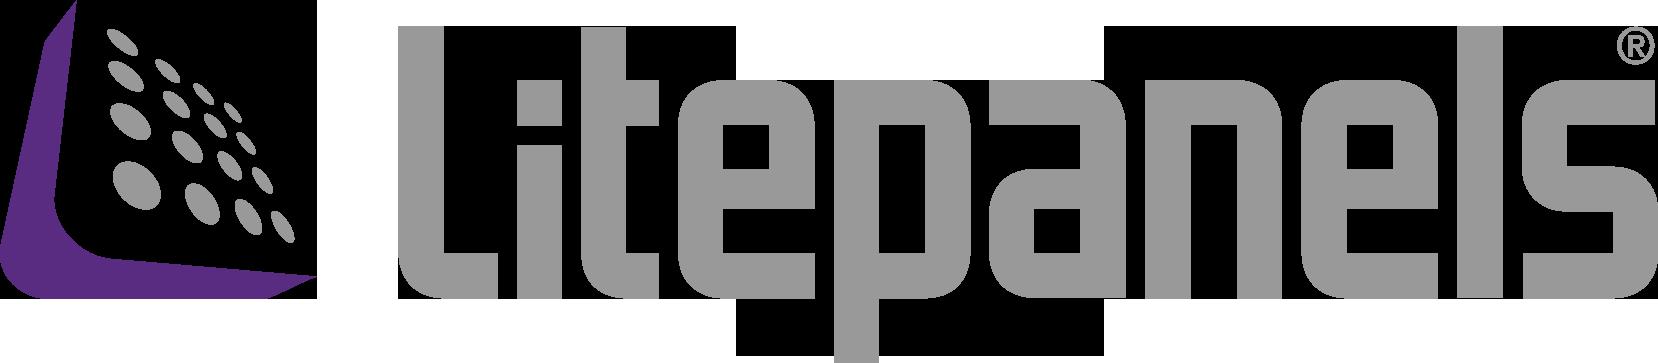 Litepanels-a-Vitec-Group-Brand